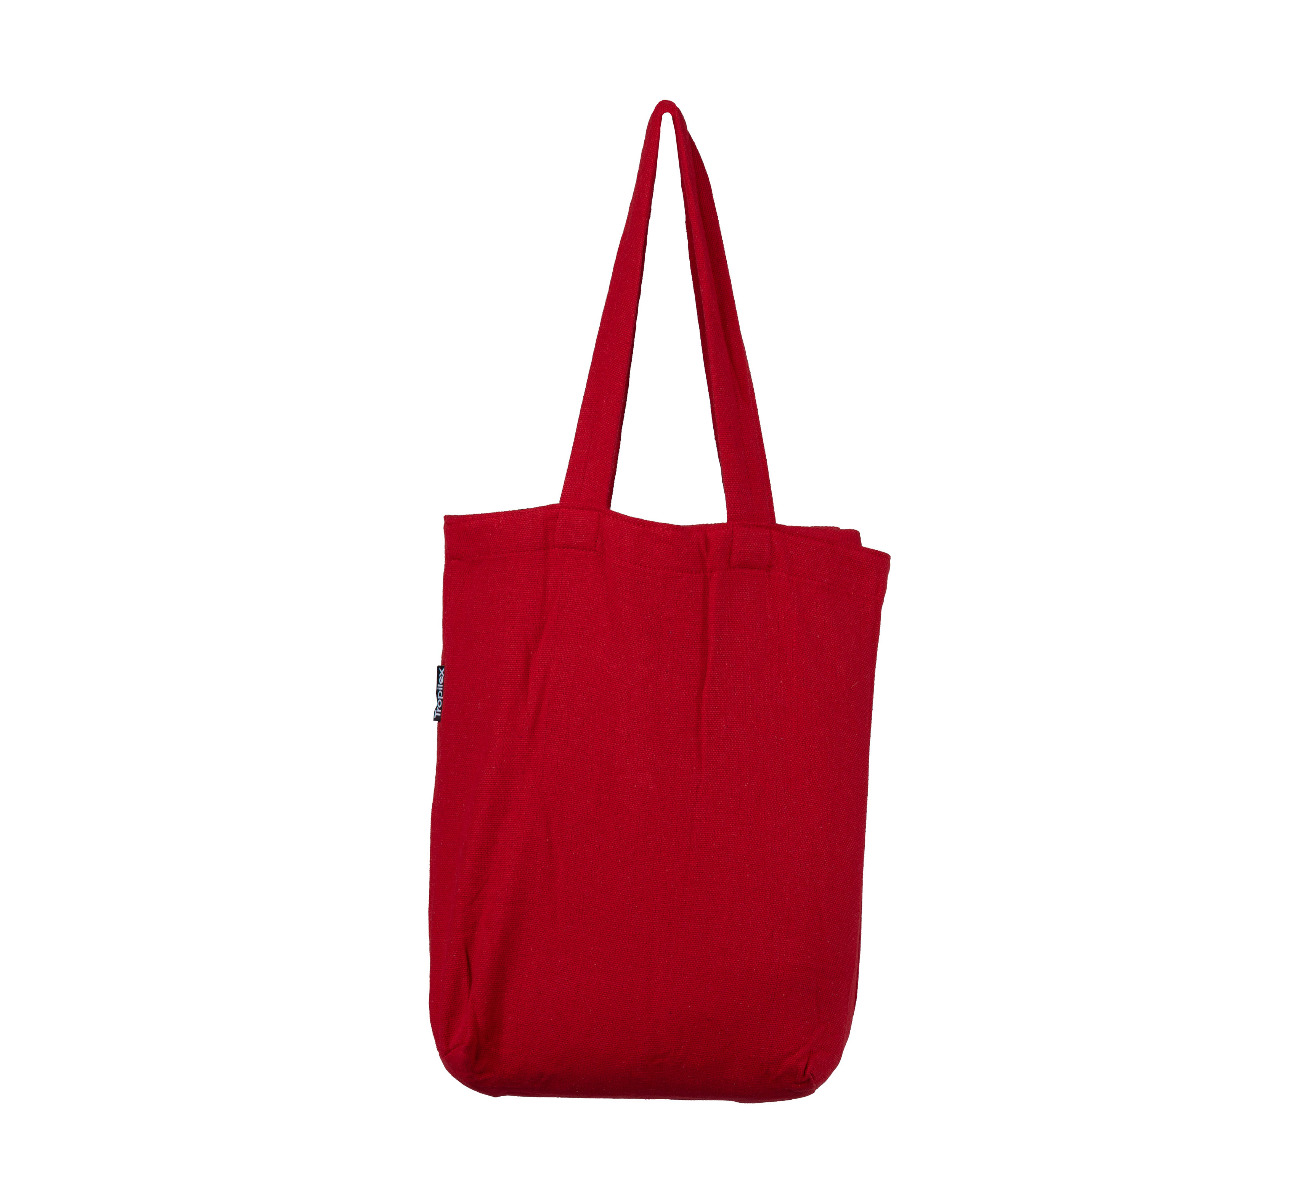 Hangmat Familie 'Pure' Red - Rood - Tropilex ®